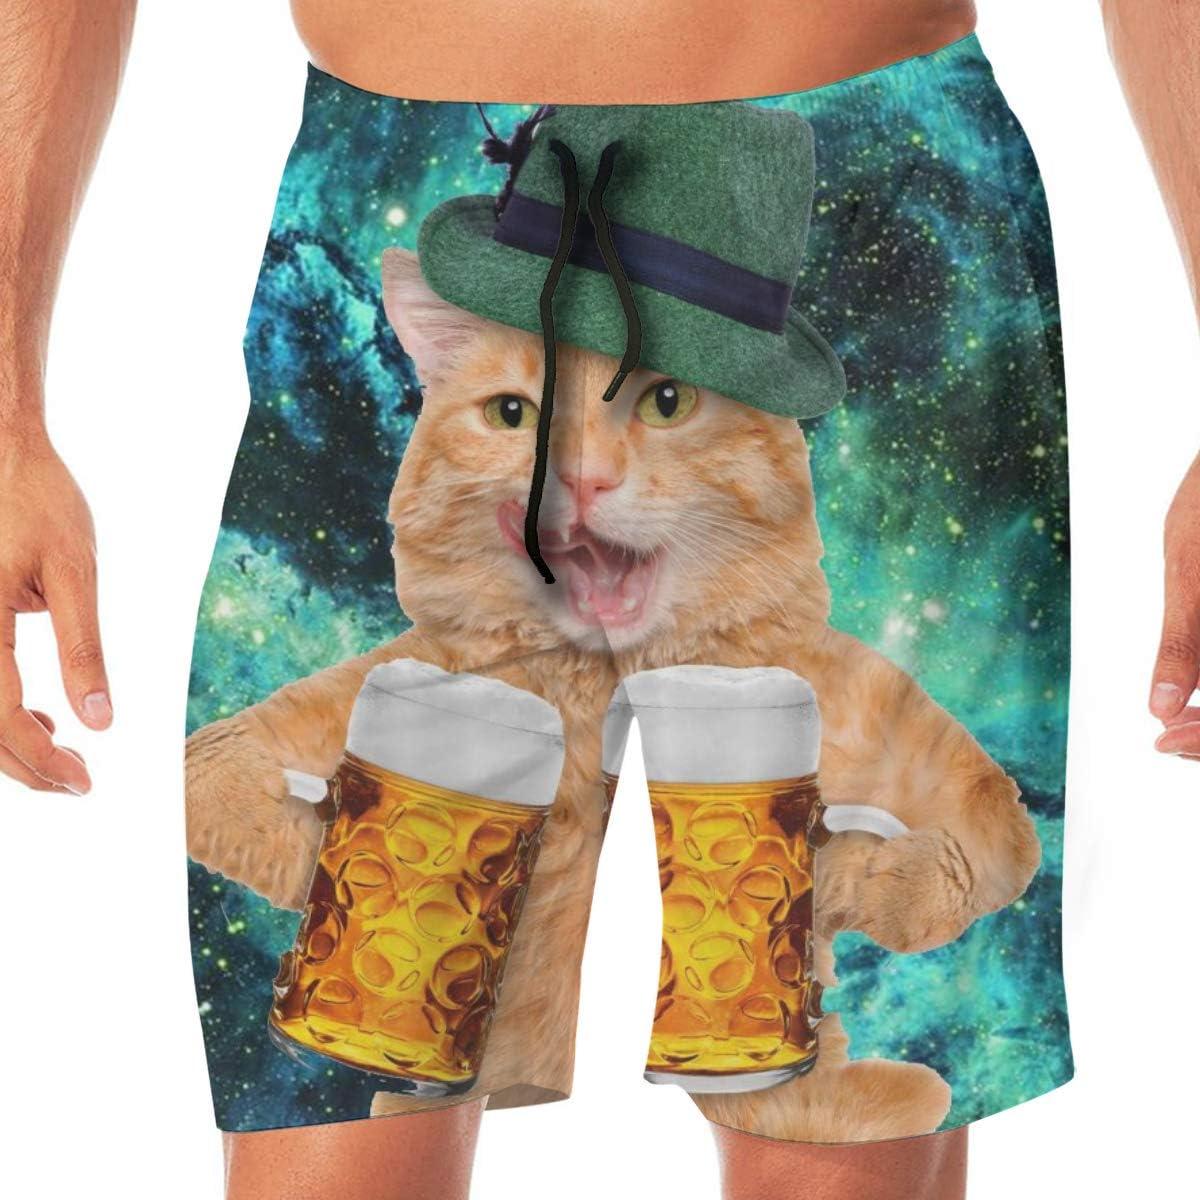 NiYoung Extreme Comfort Swim Trunks Big /& Tall Half Pants for Men Boy Fast Dry Sportwear